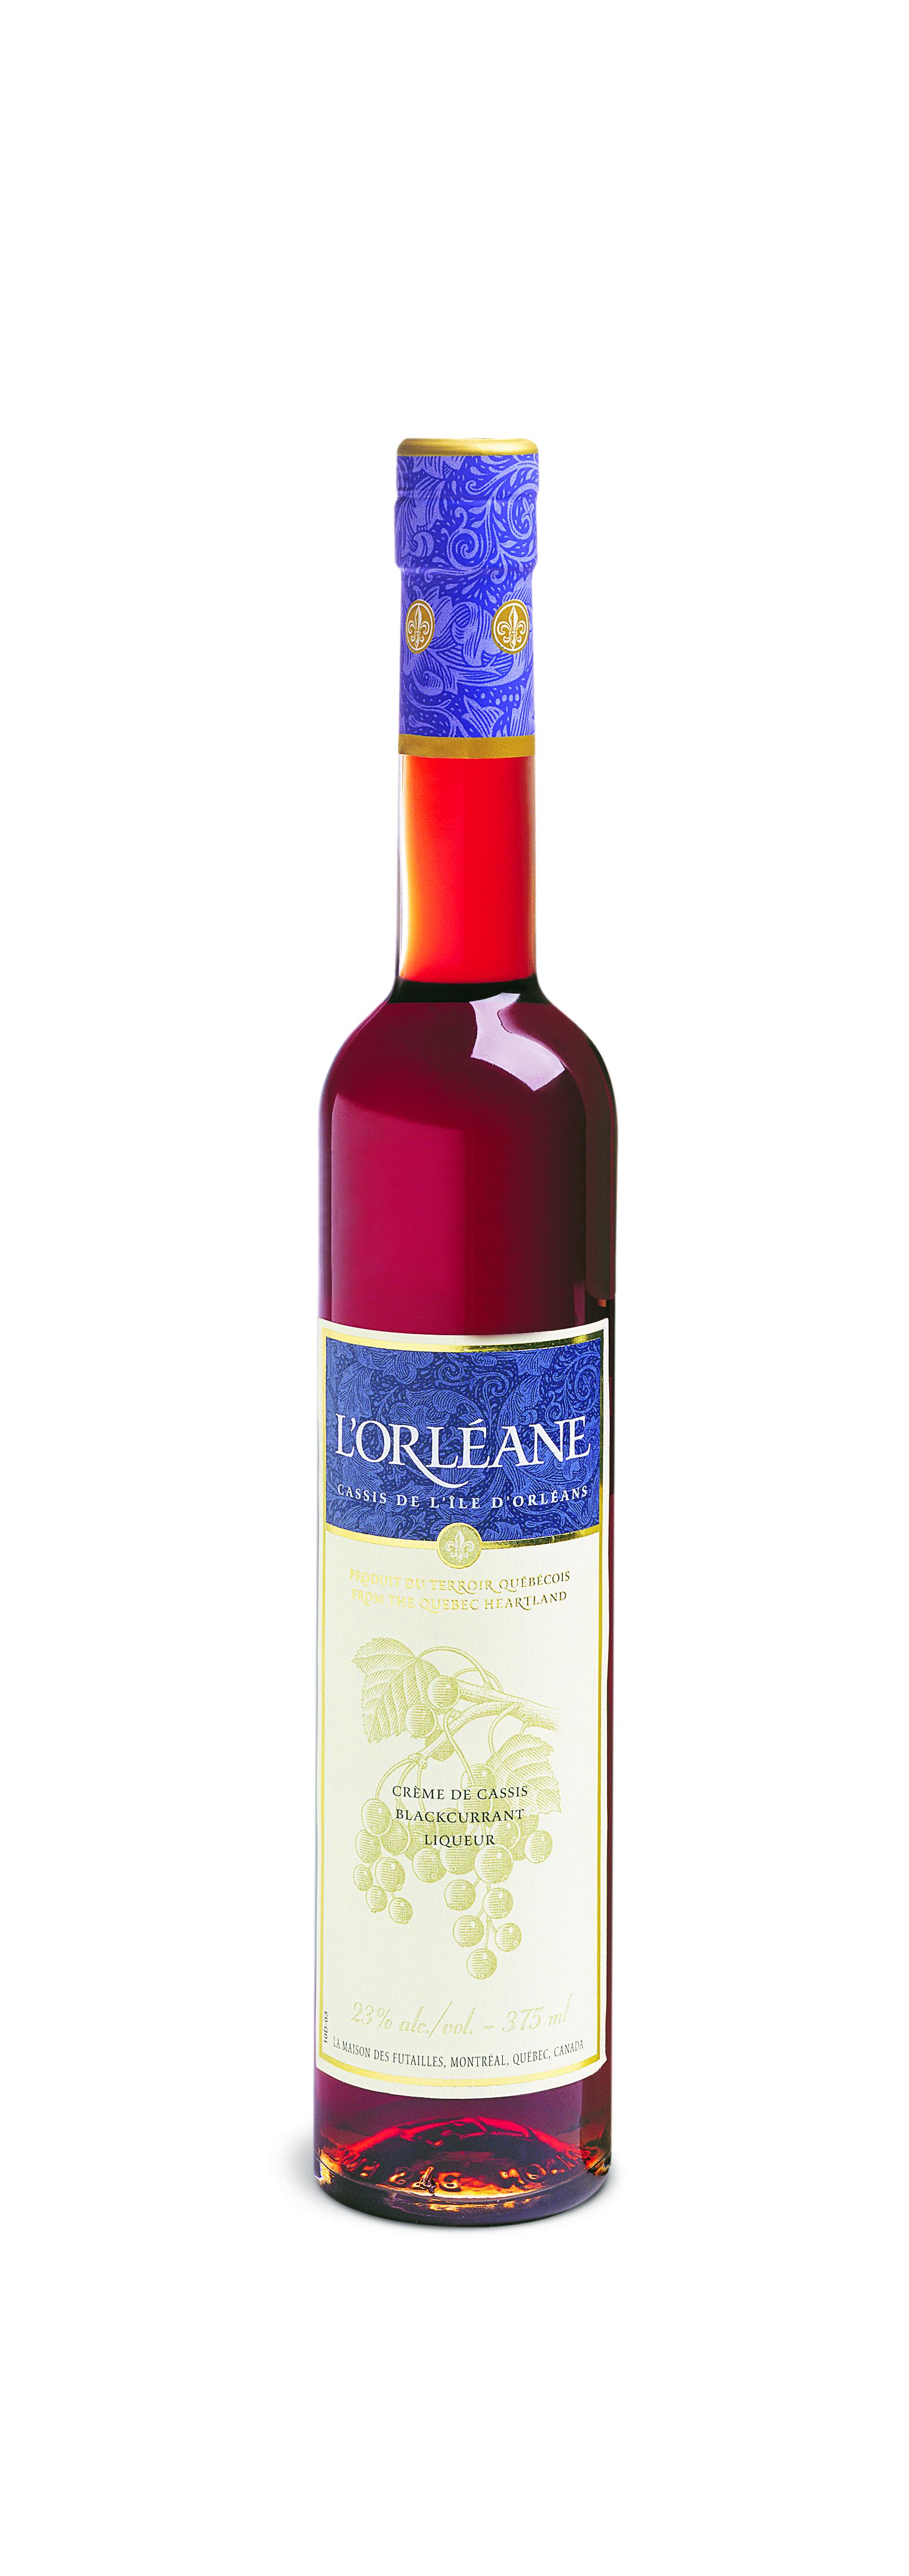 L'Orléane